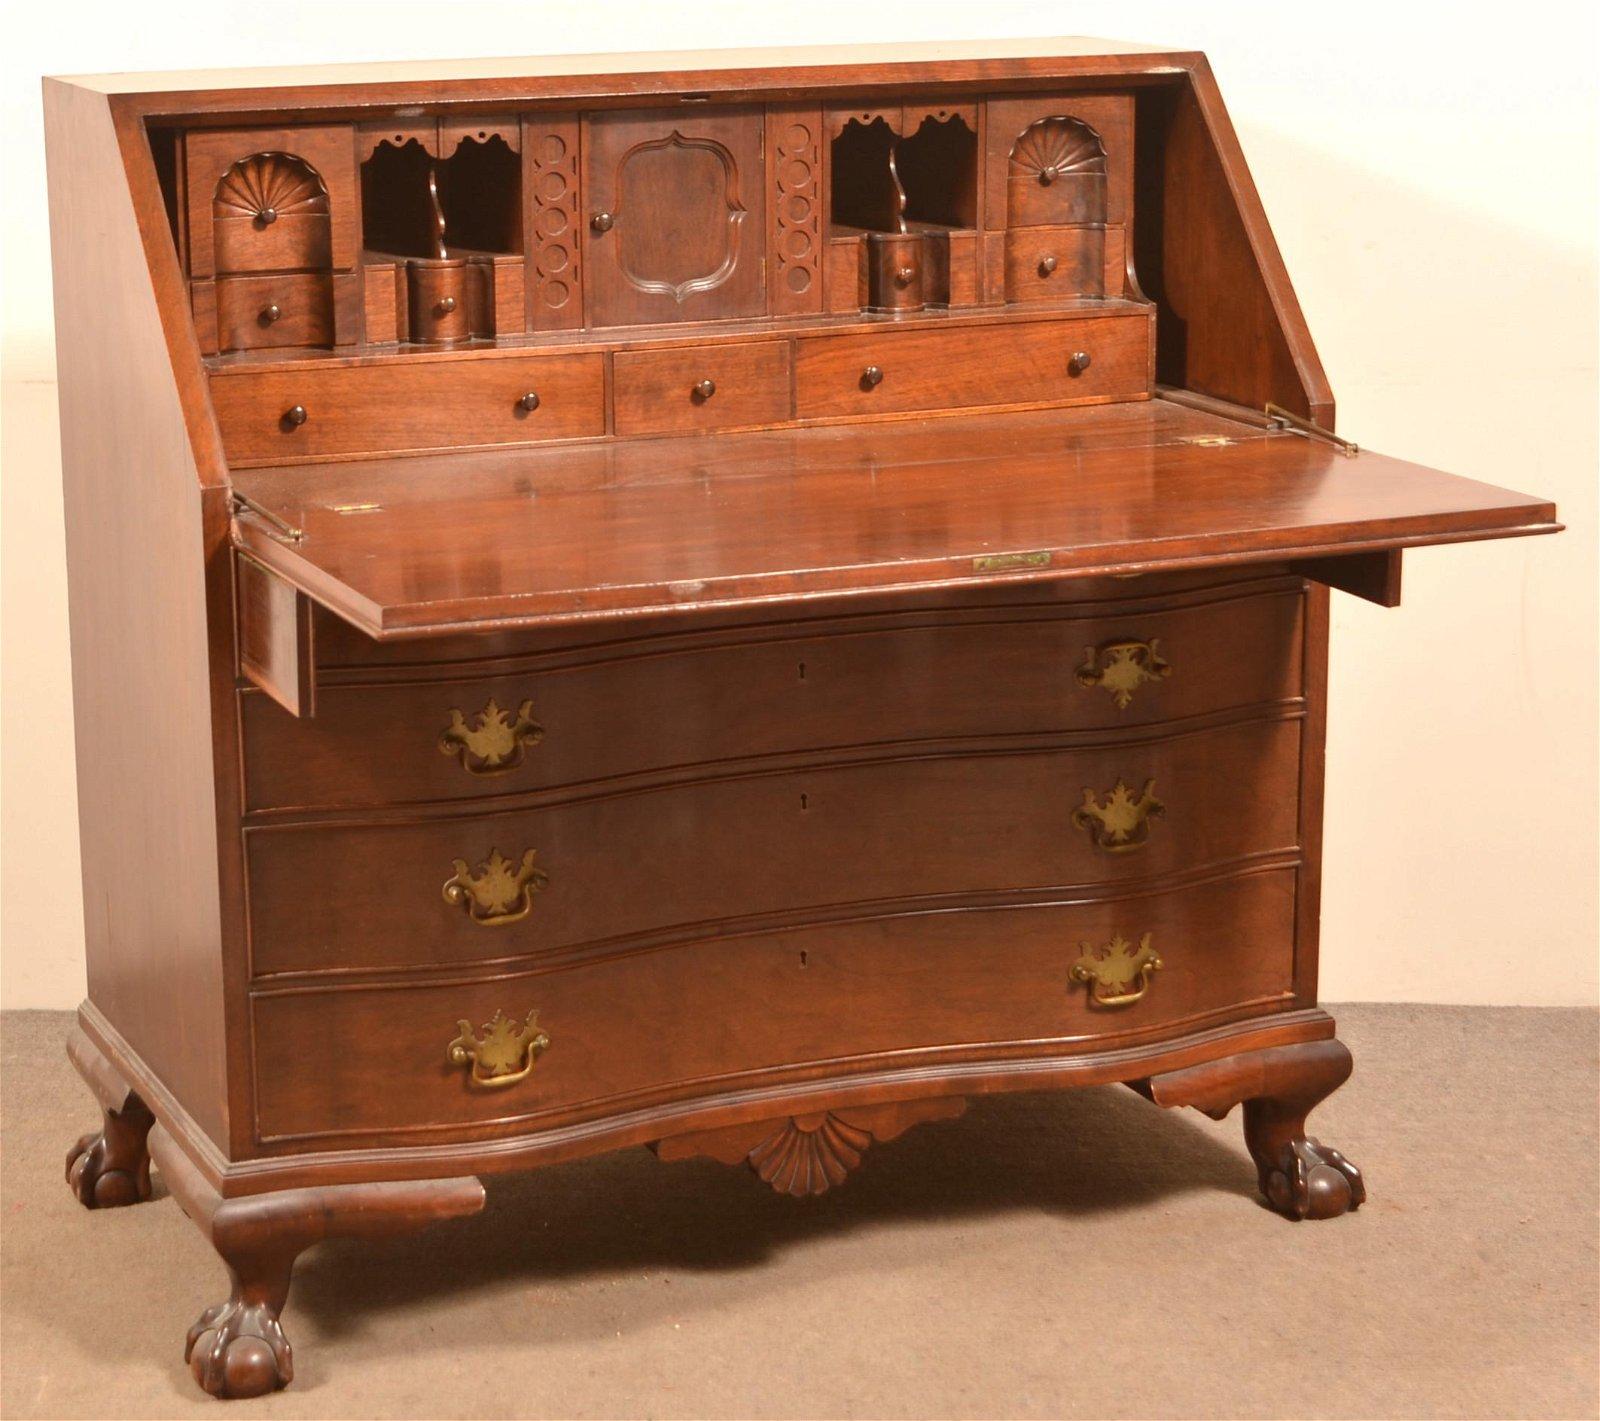 Chippendale Style Mahogany Slant-Lid Desk.